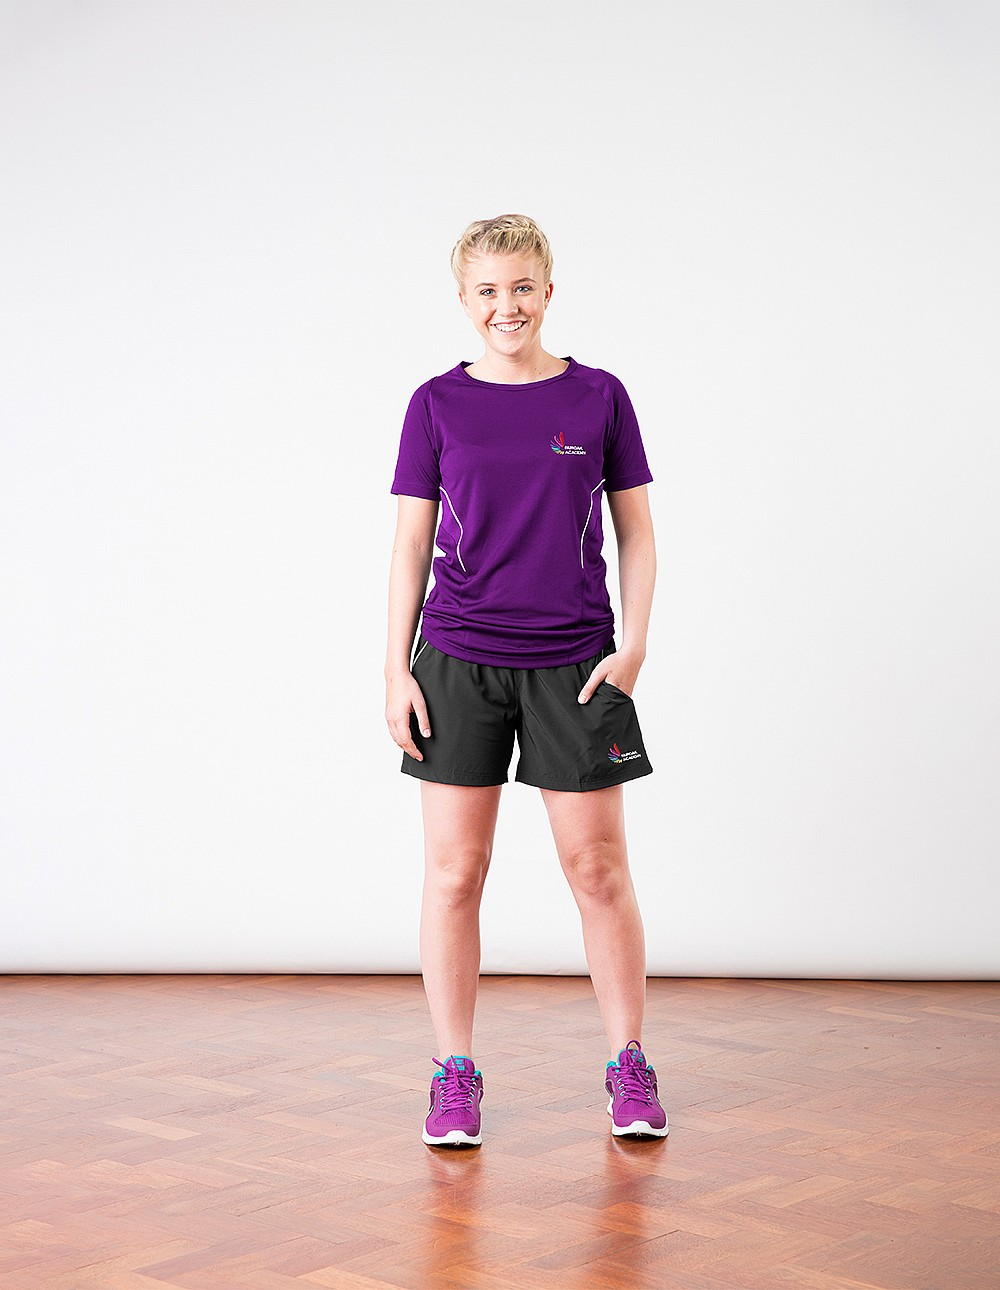 Ladies Training top by Aptus